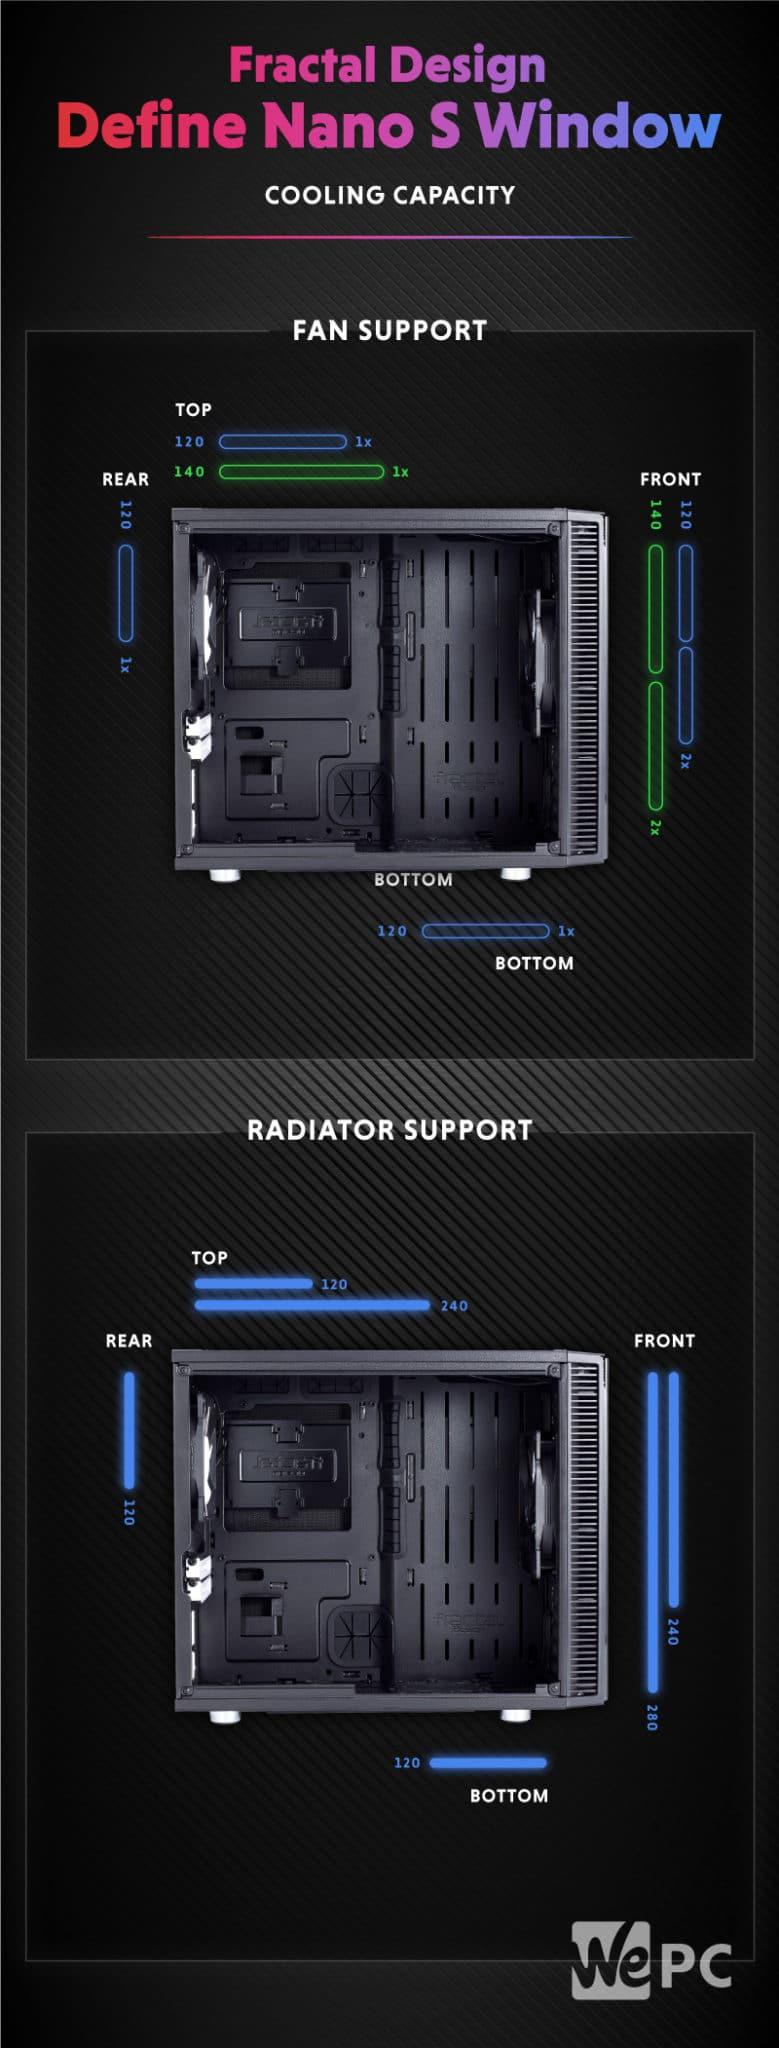 Fractal Design Define Nano S Window Cooling Capacity